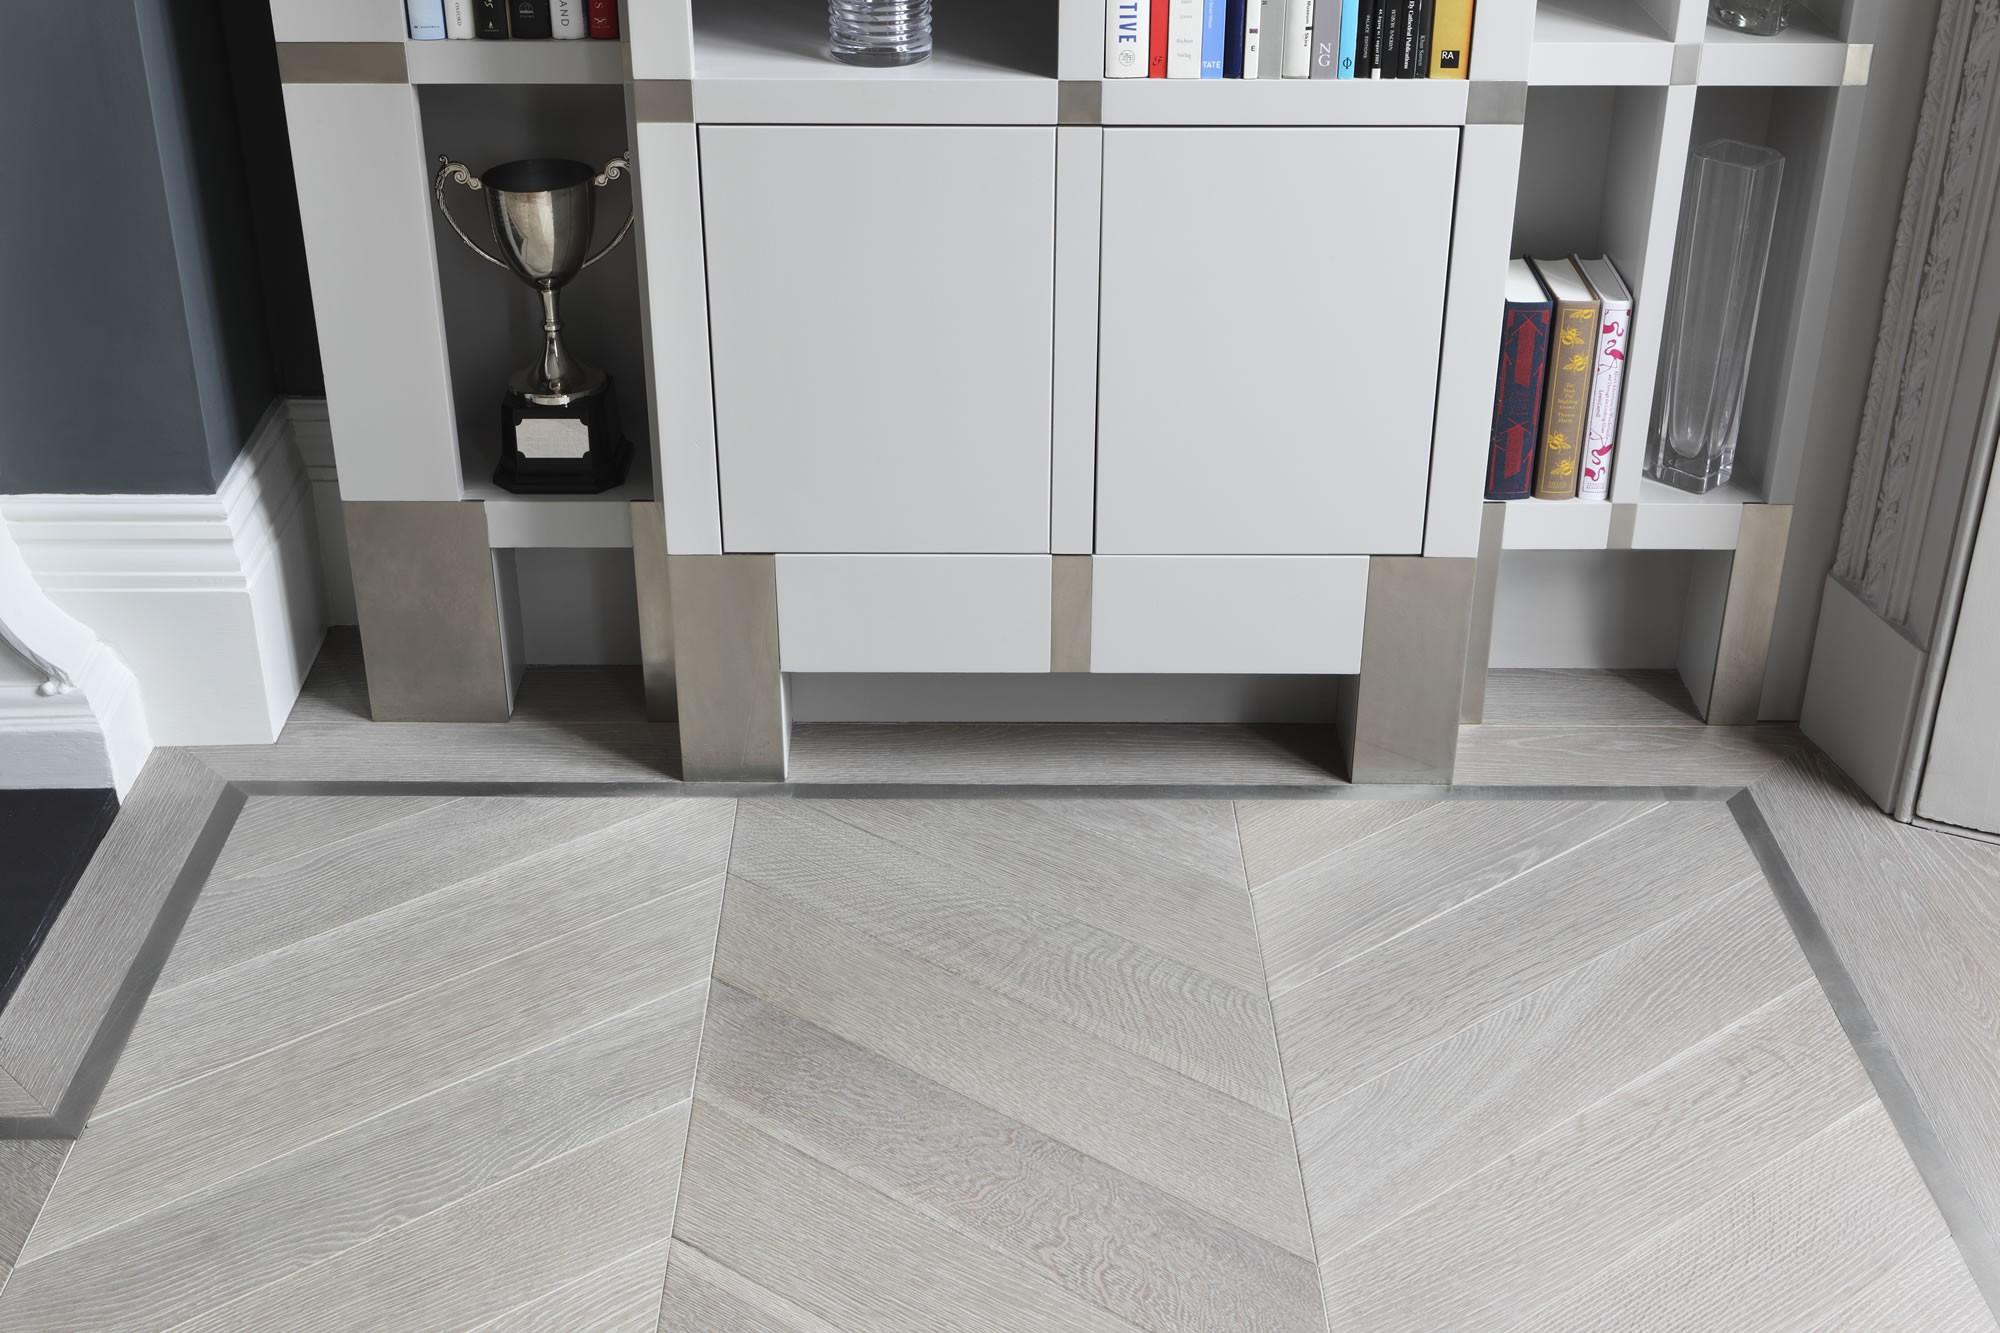 Pewter inlay | Ash grey floor | Element 7